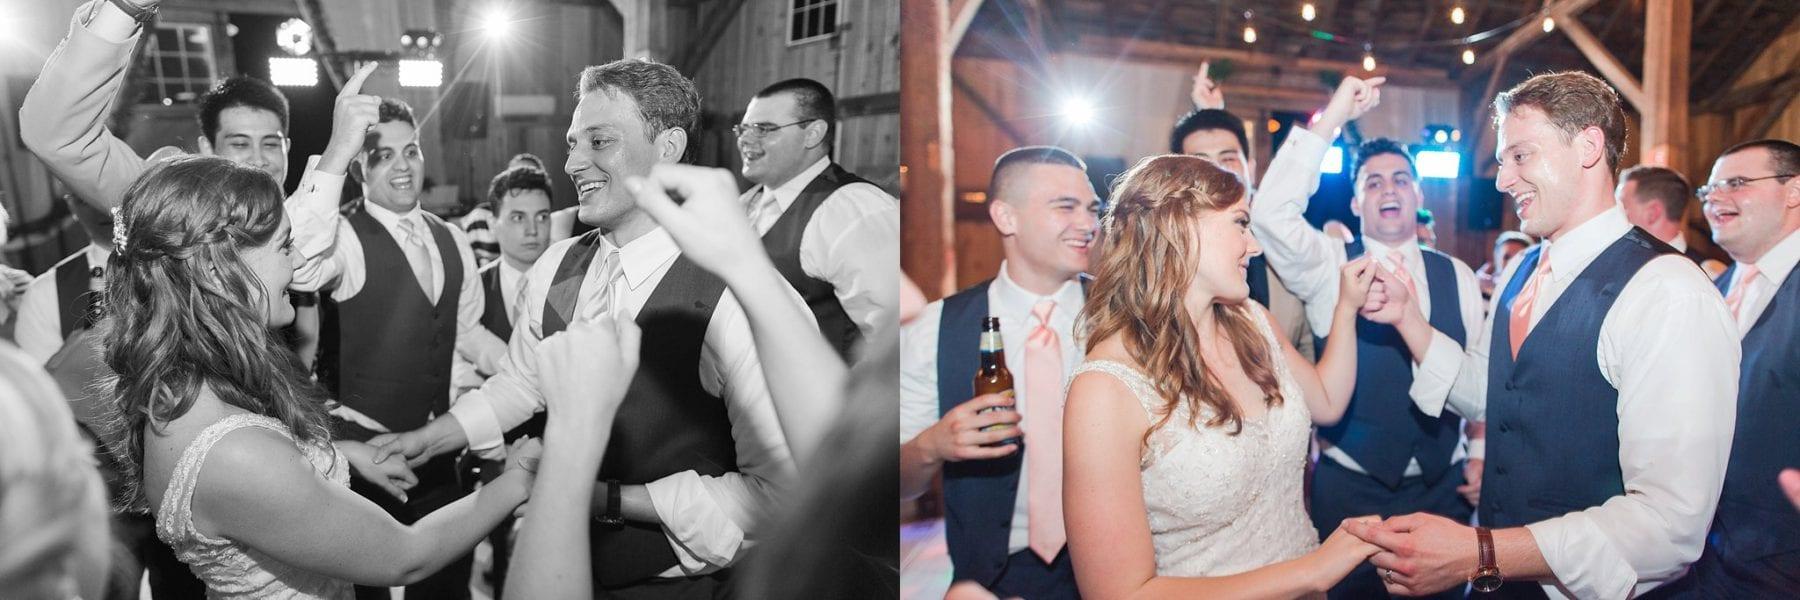 Justin & Megan Big Spring Farm Wedding Photos-598.jpg